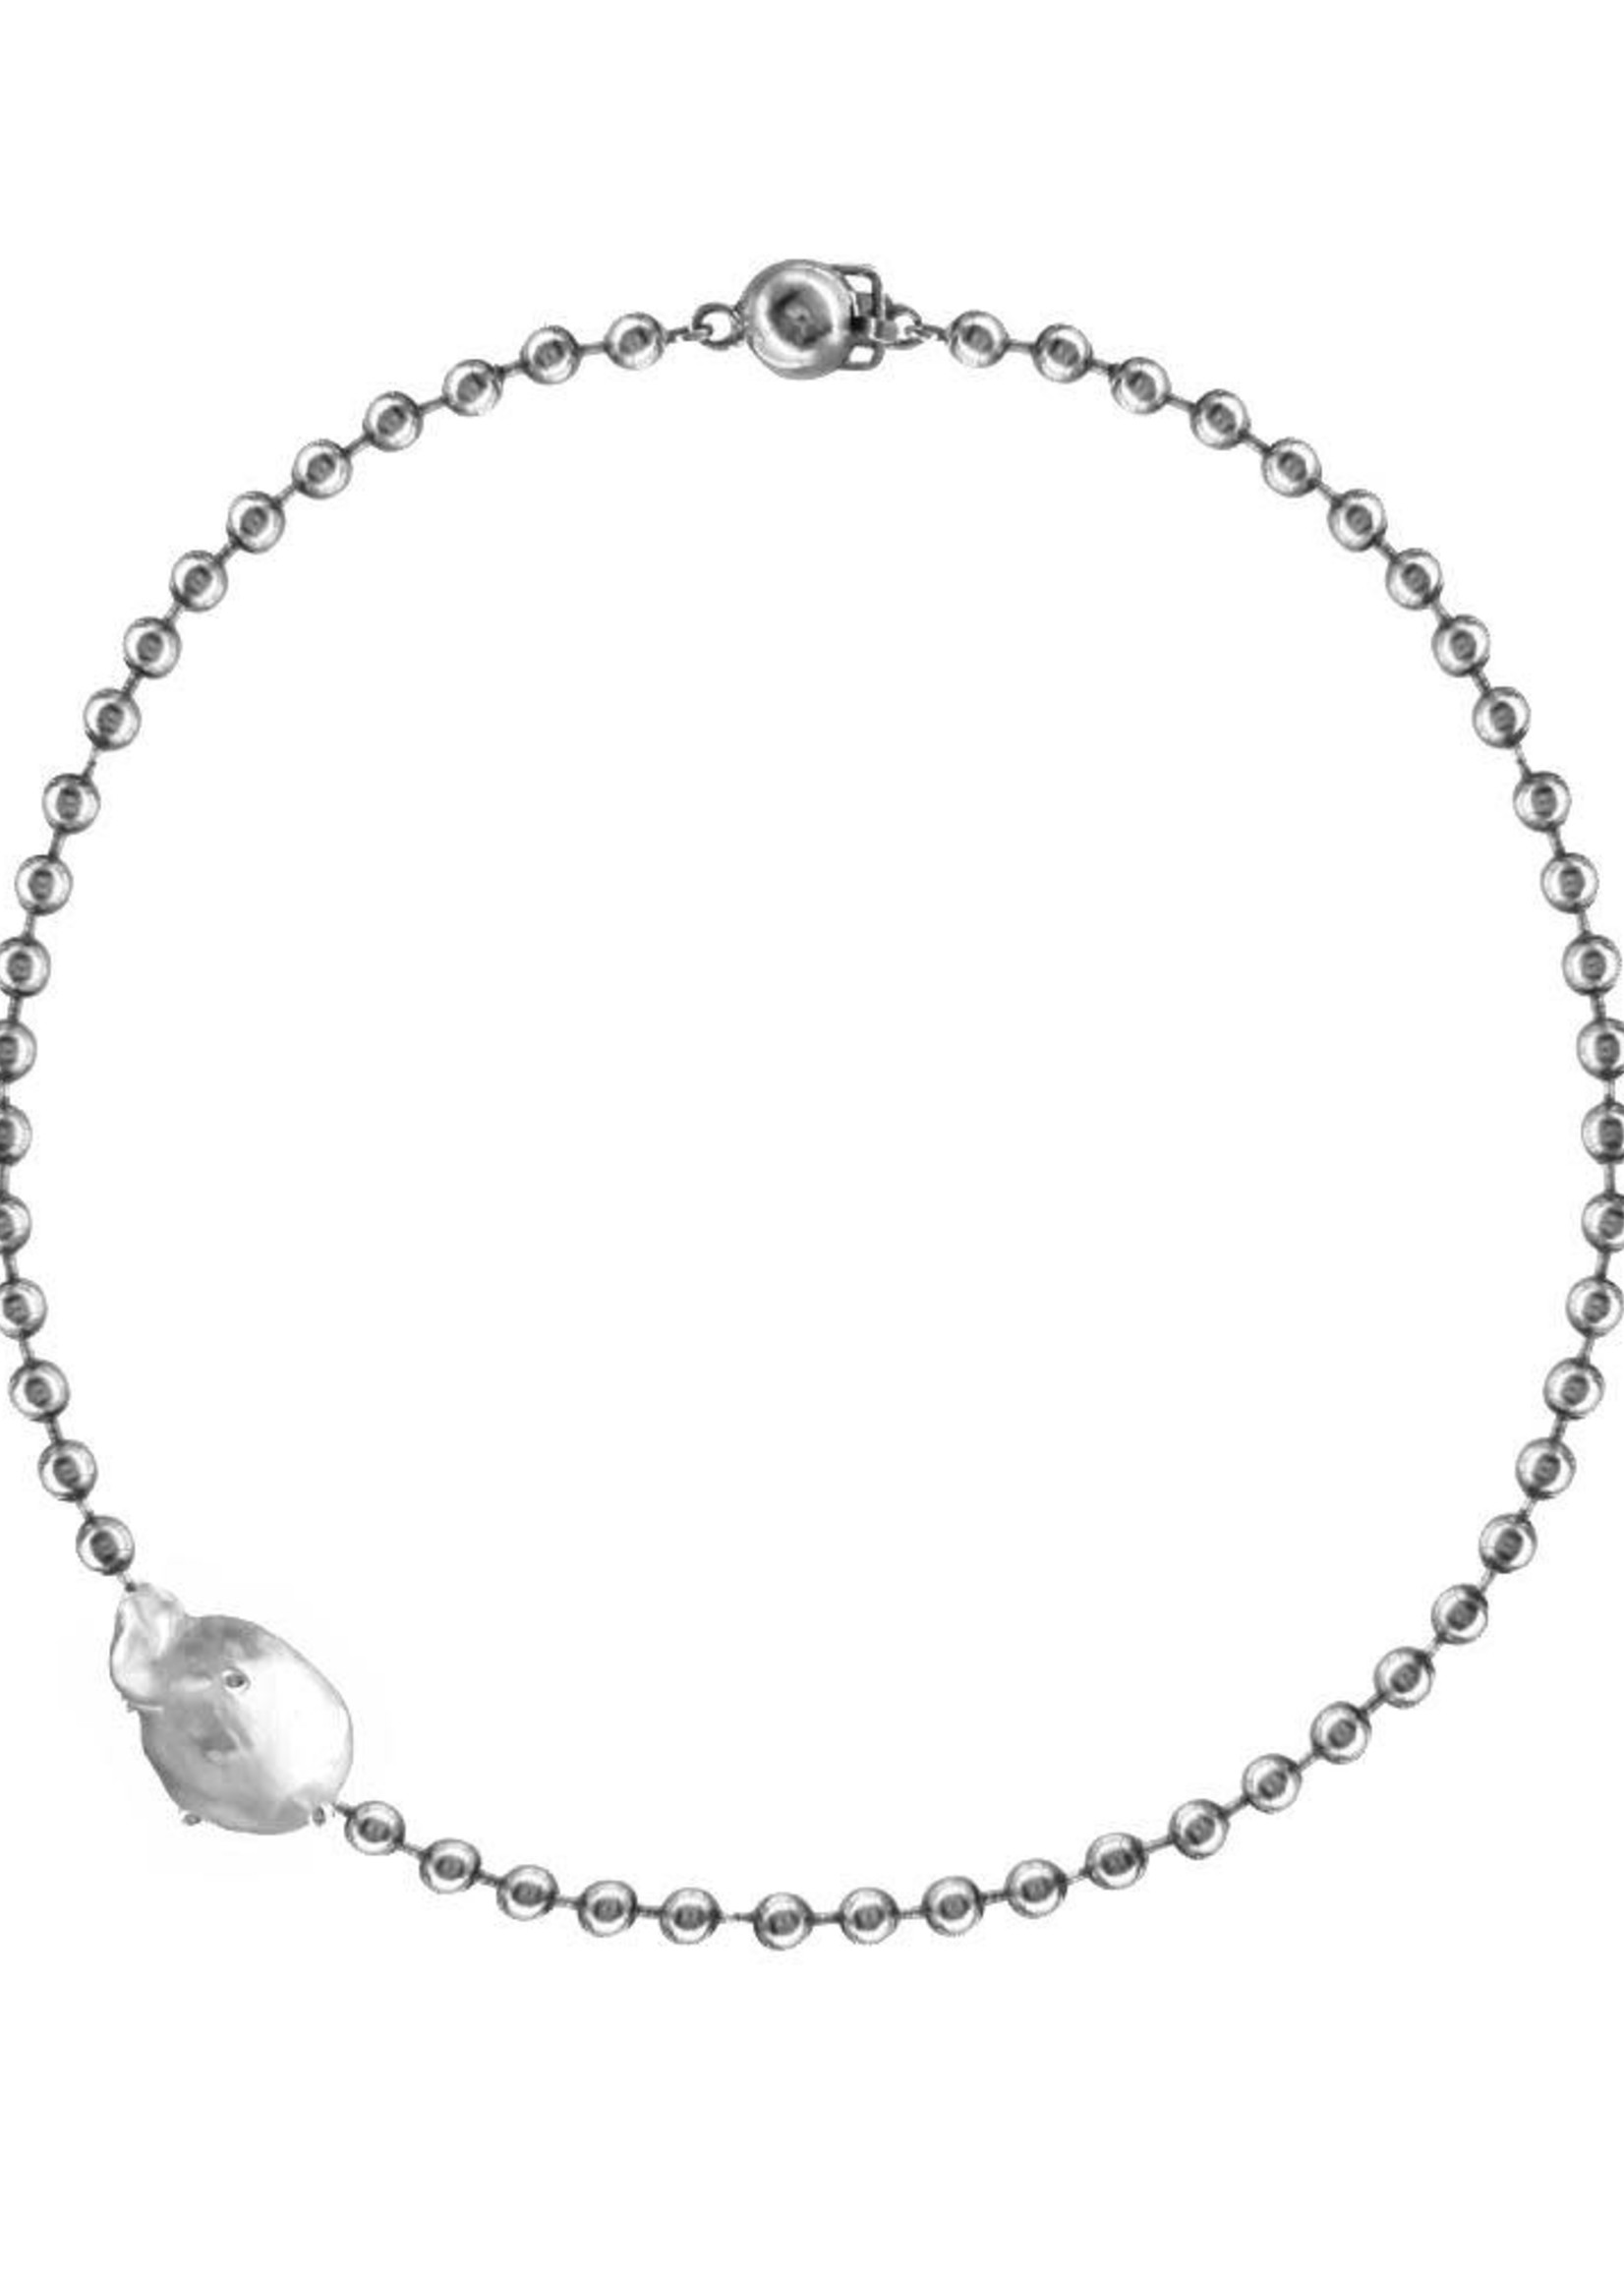 VARON Perlita Necklace in Sterling Silver